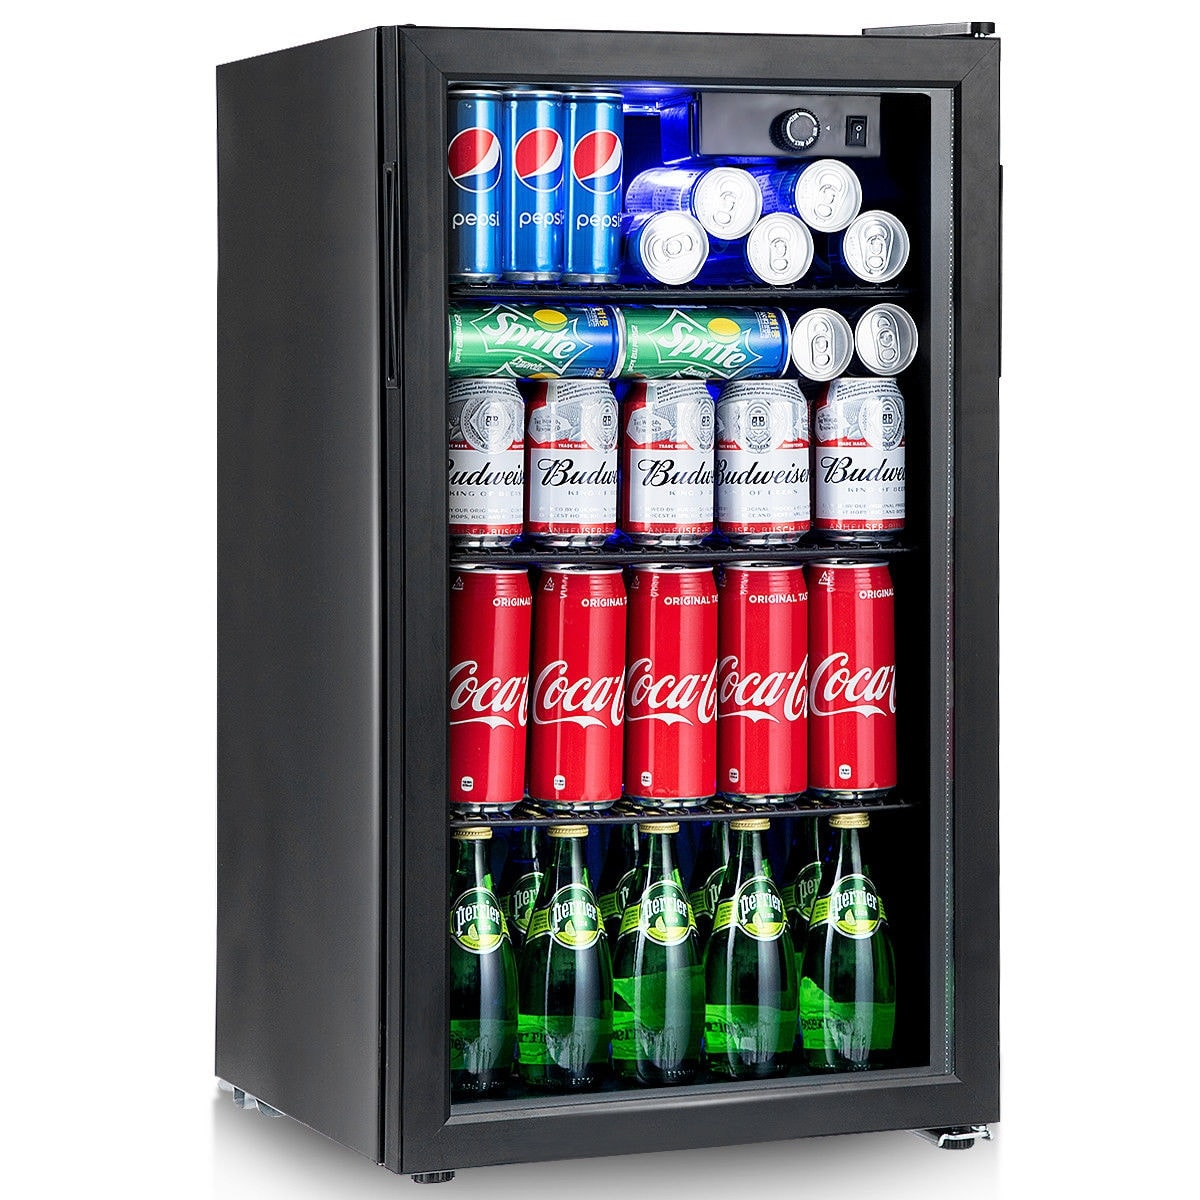 Shop Gymax 120 Can Beverage Refrigerator Beer Wine Soda Drink Cooler